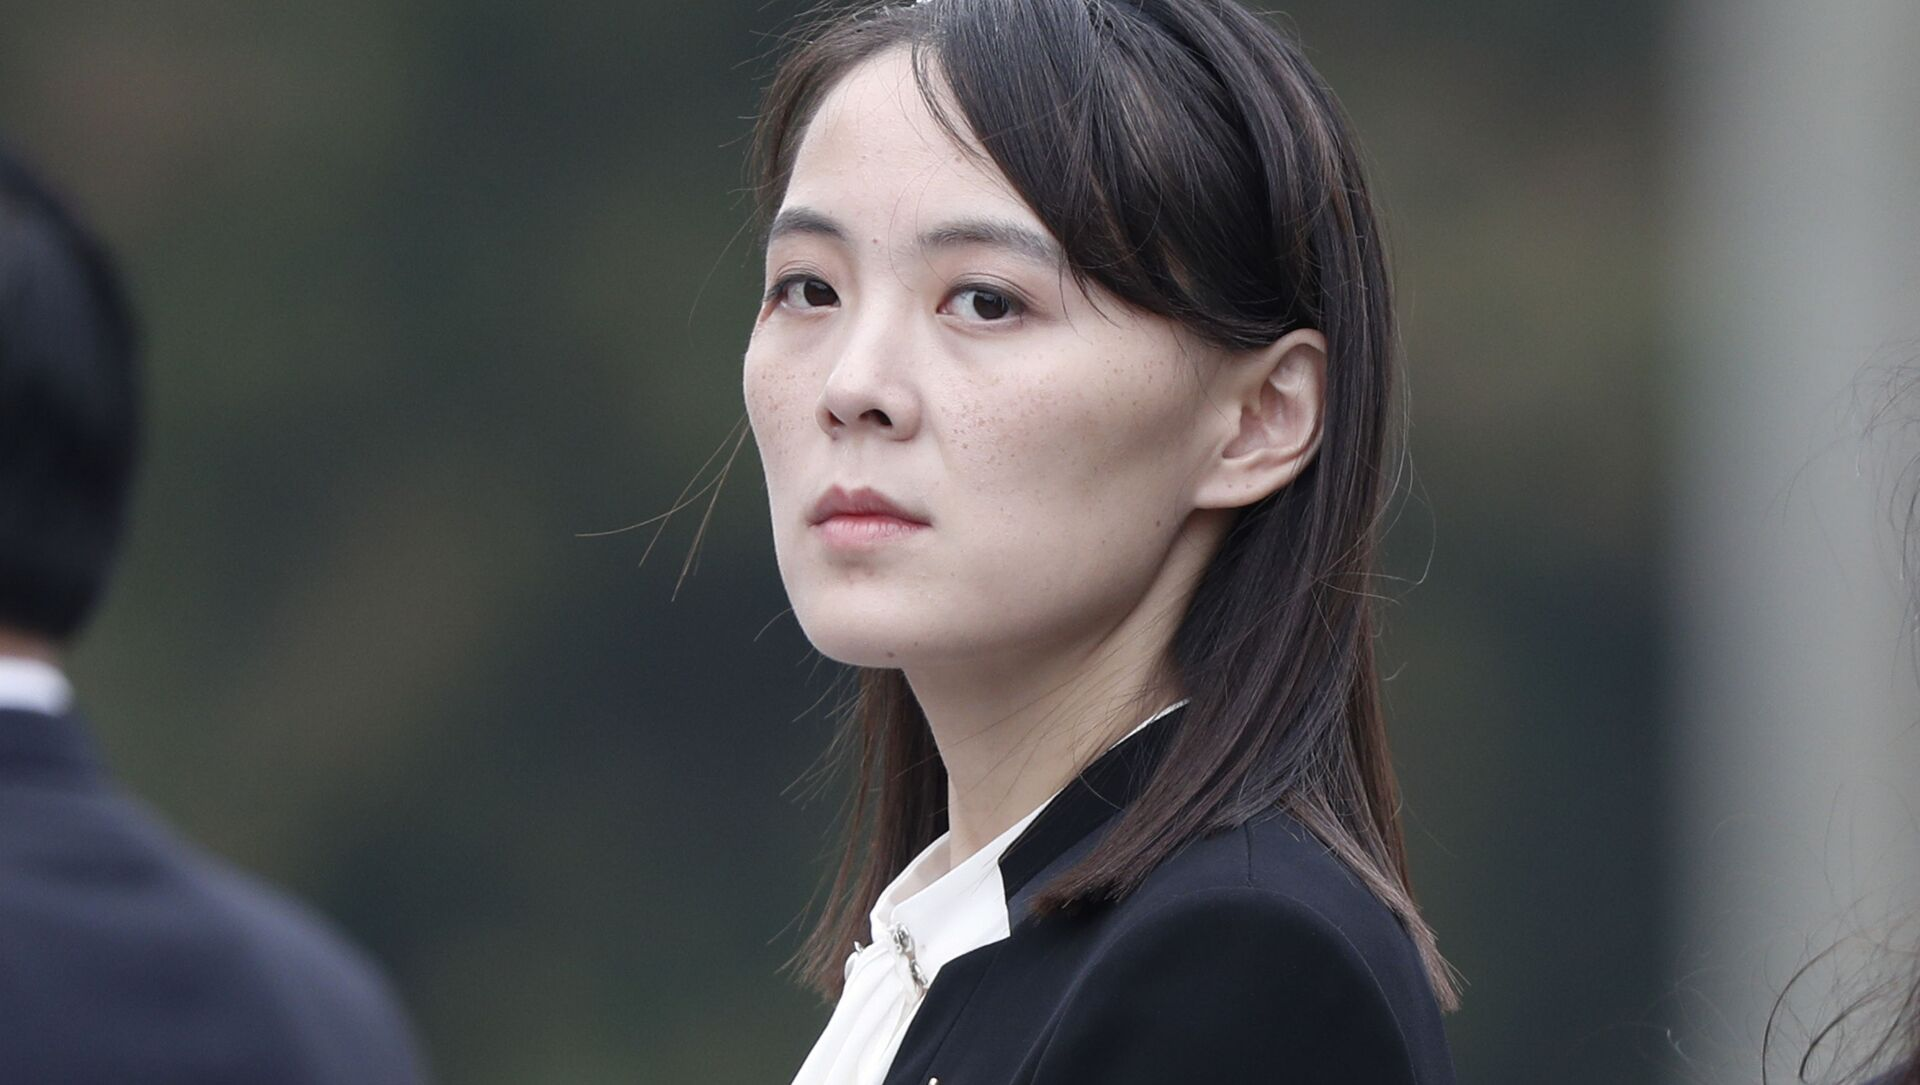 Kim Yo-jong, sister of North Korea's leader Kim Jong-un - Sputnik International, 1920, 02.05.2021